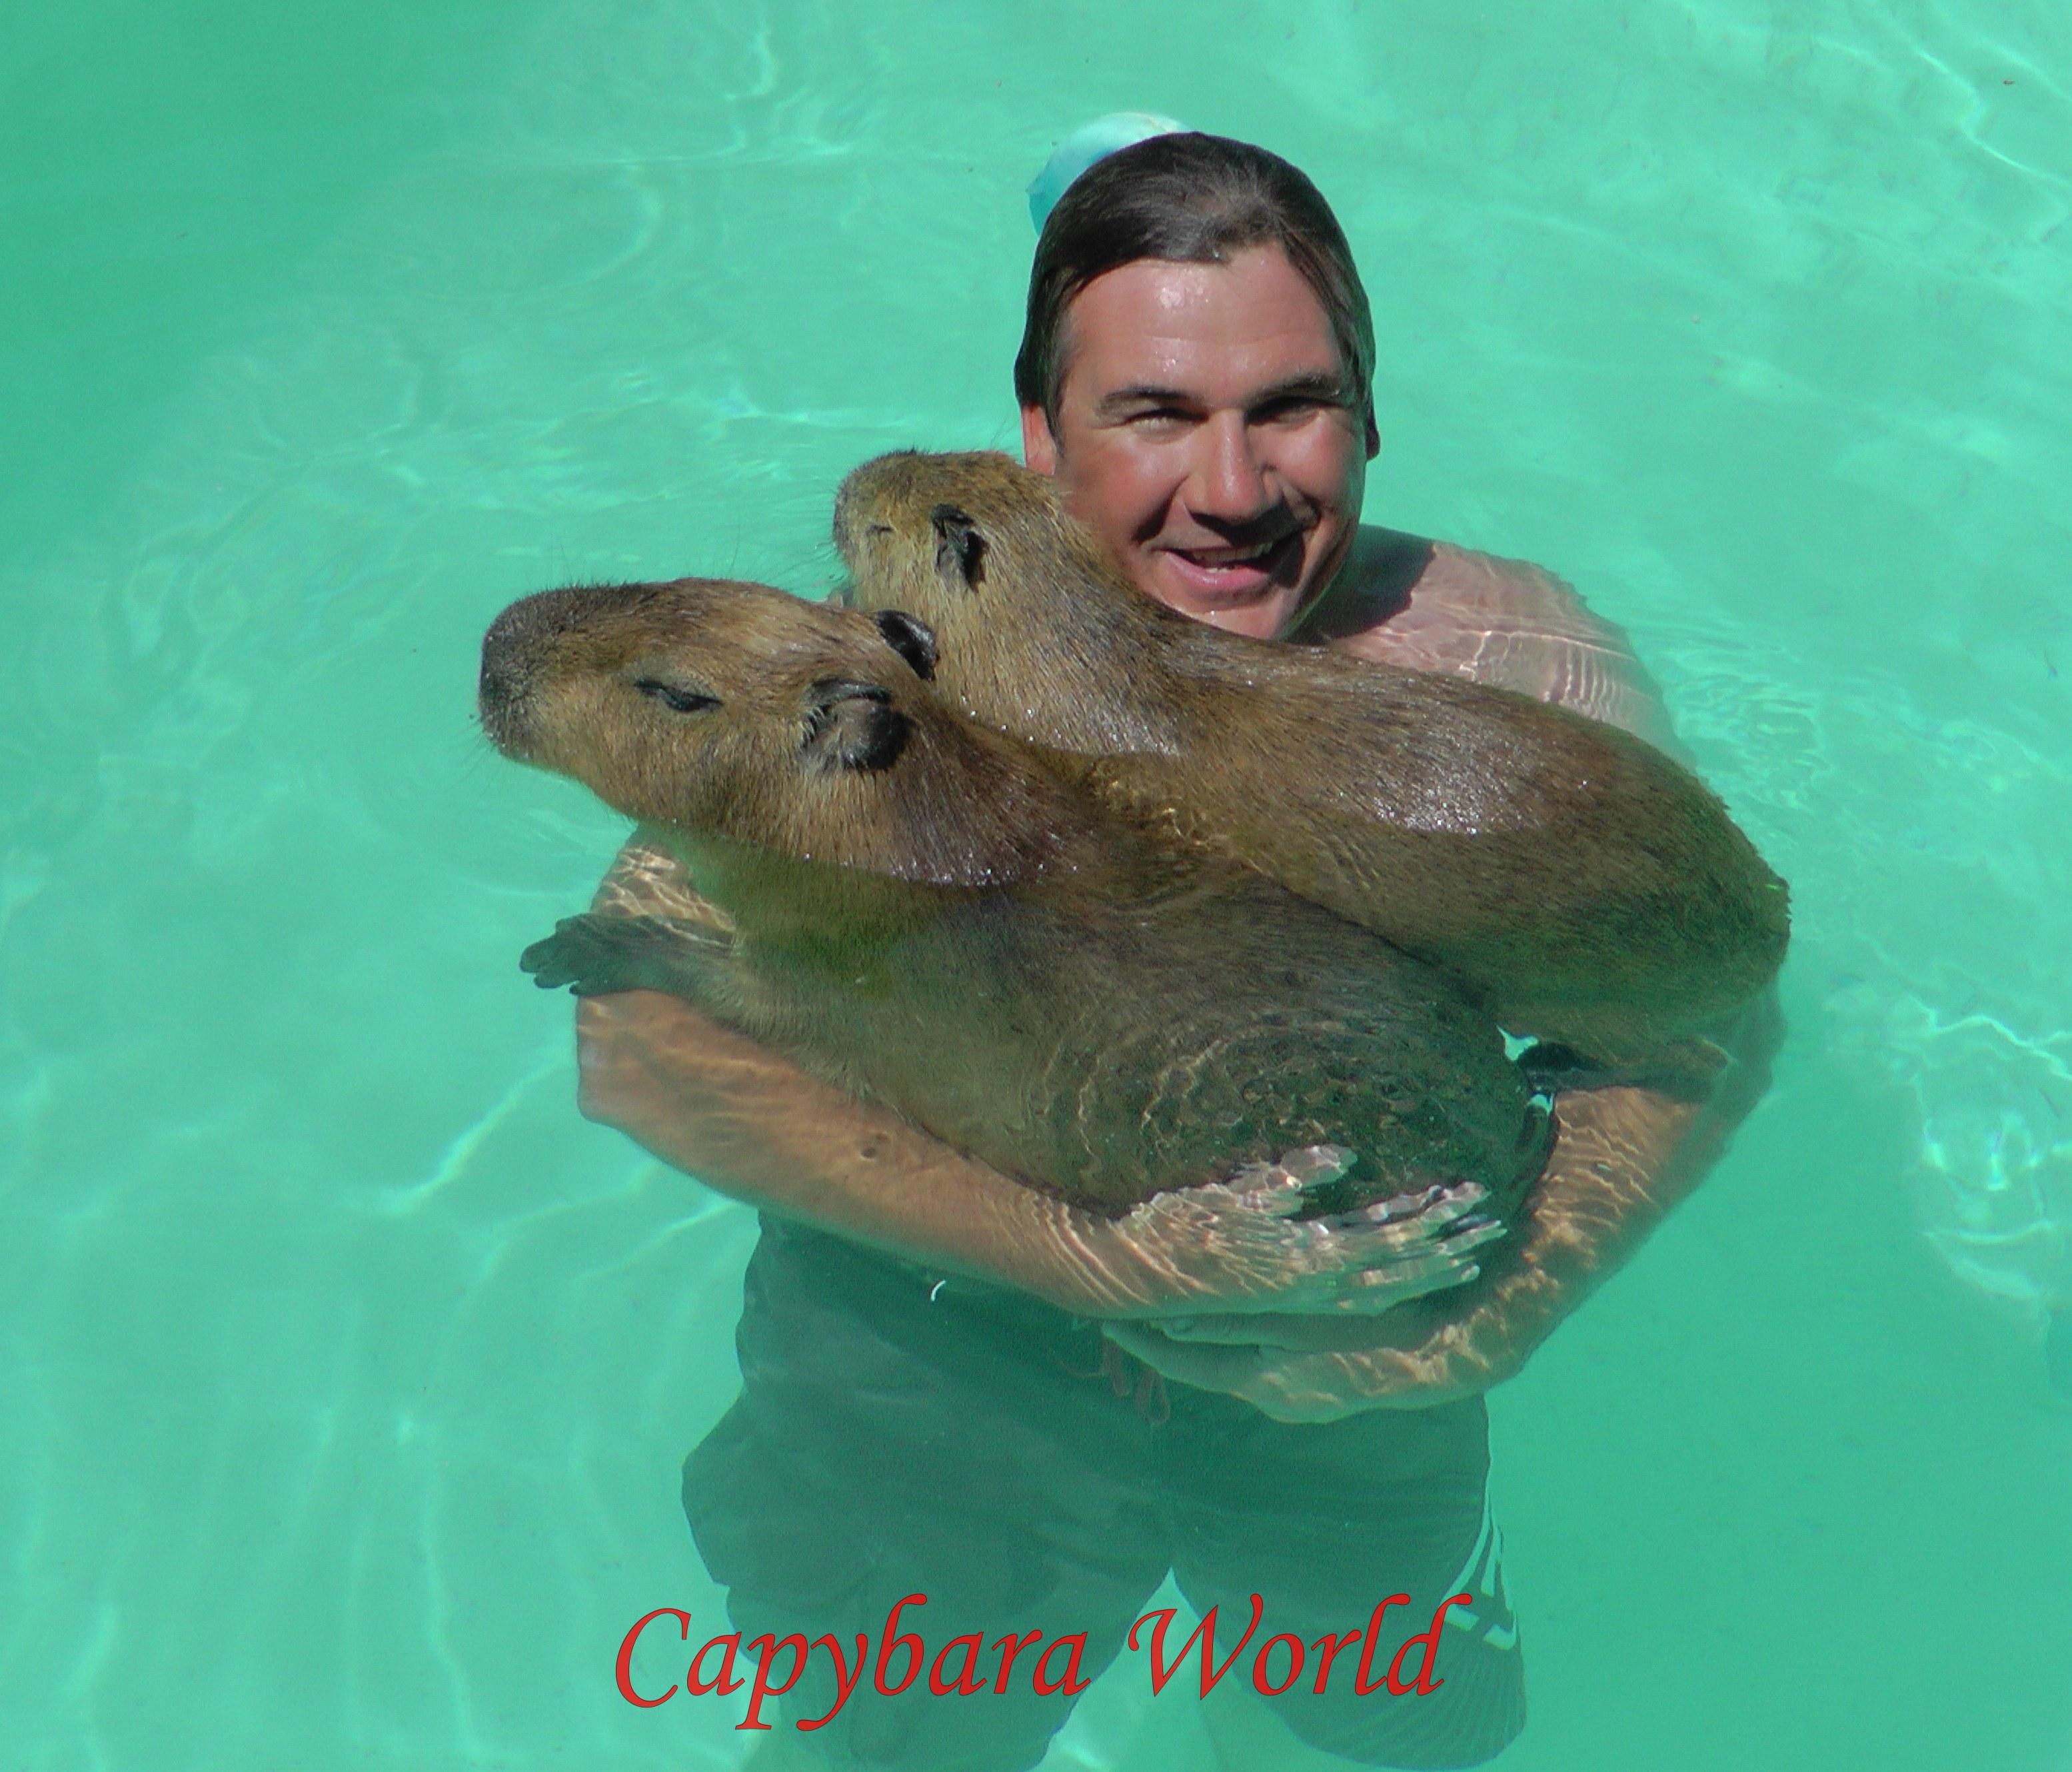 capybara wallpaper pool - photo #9